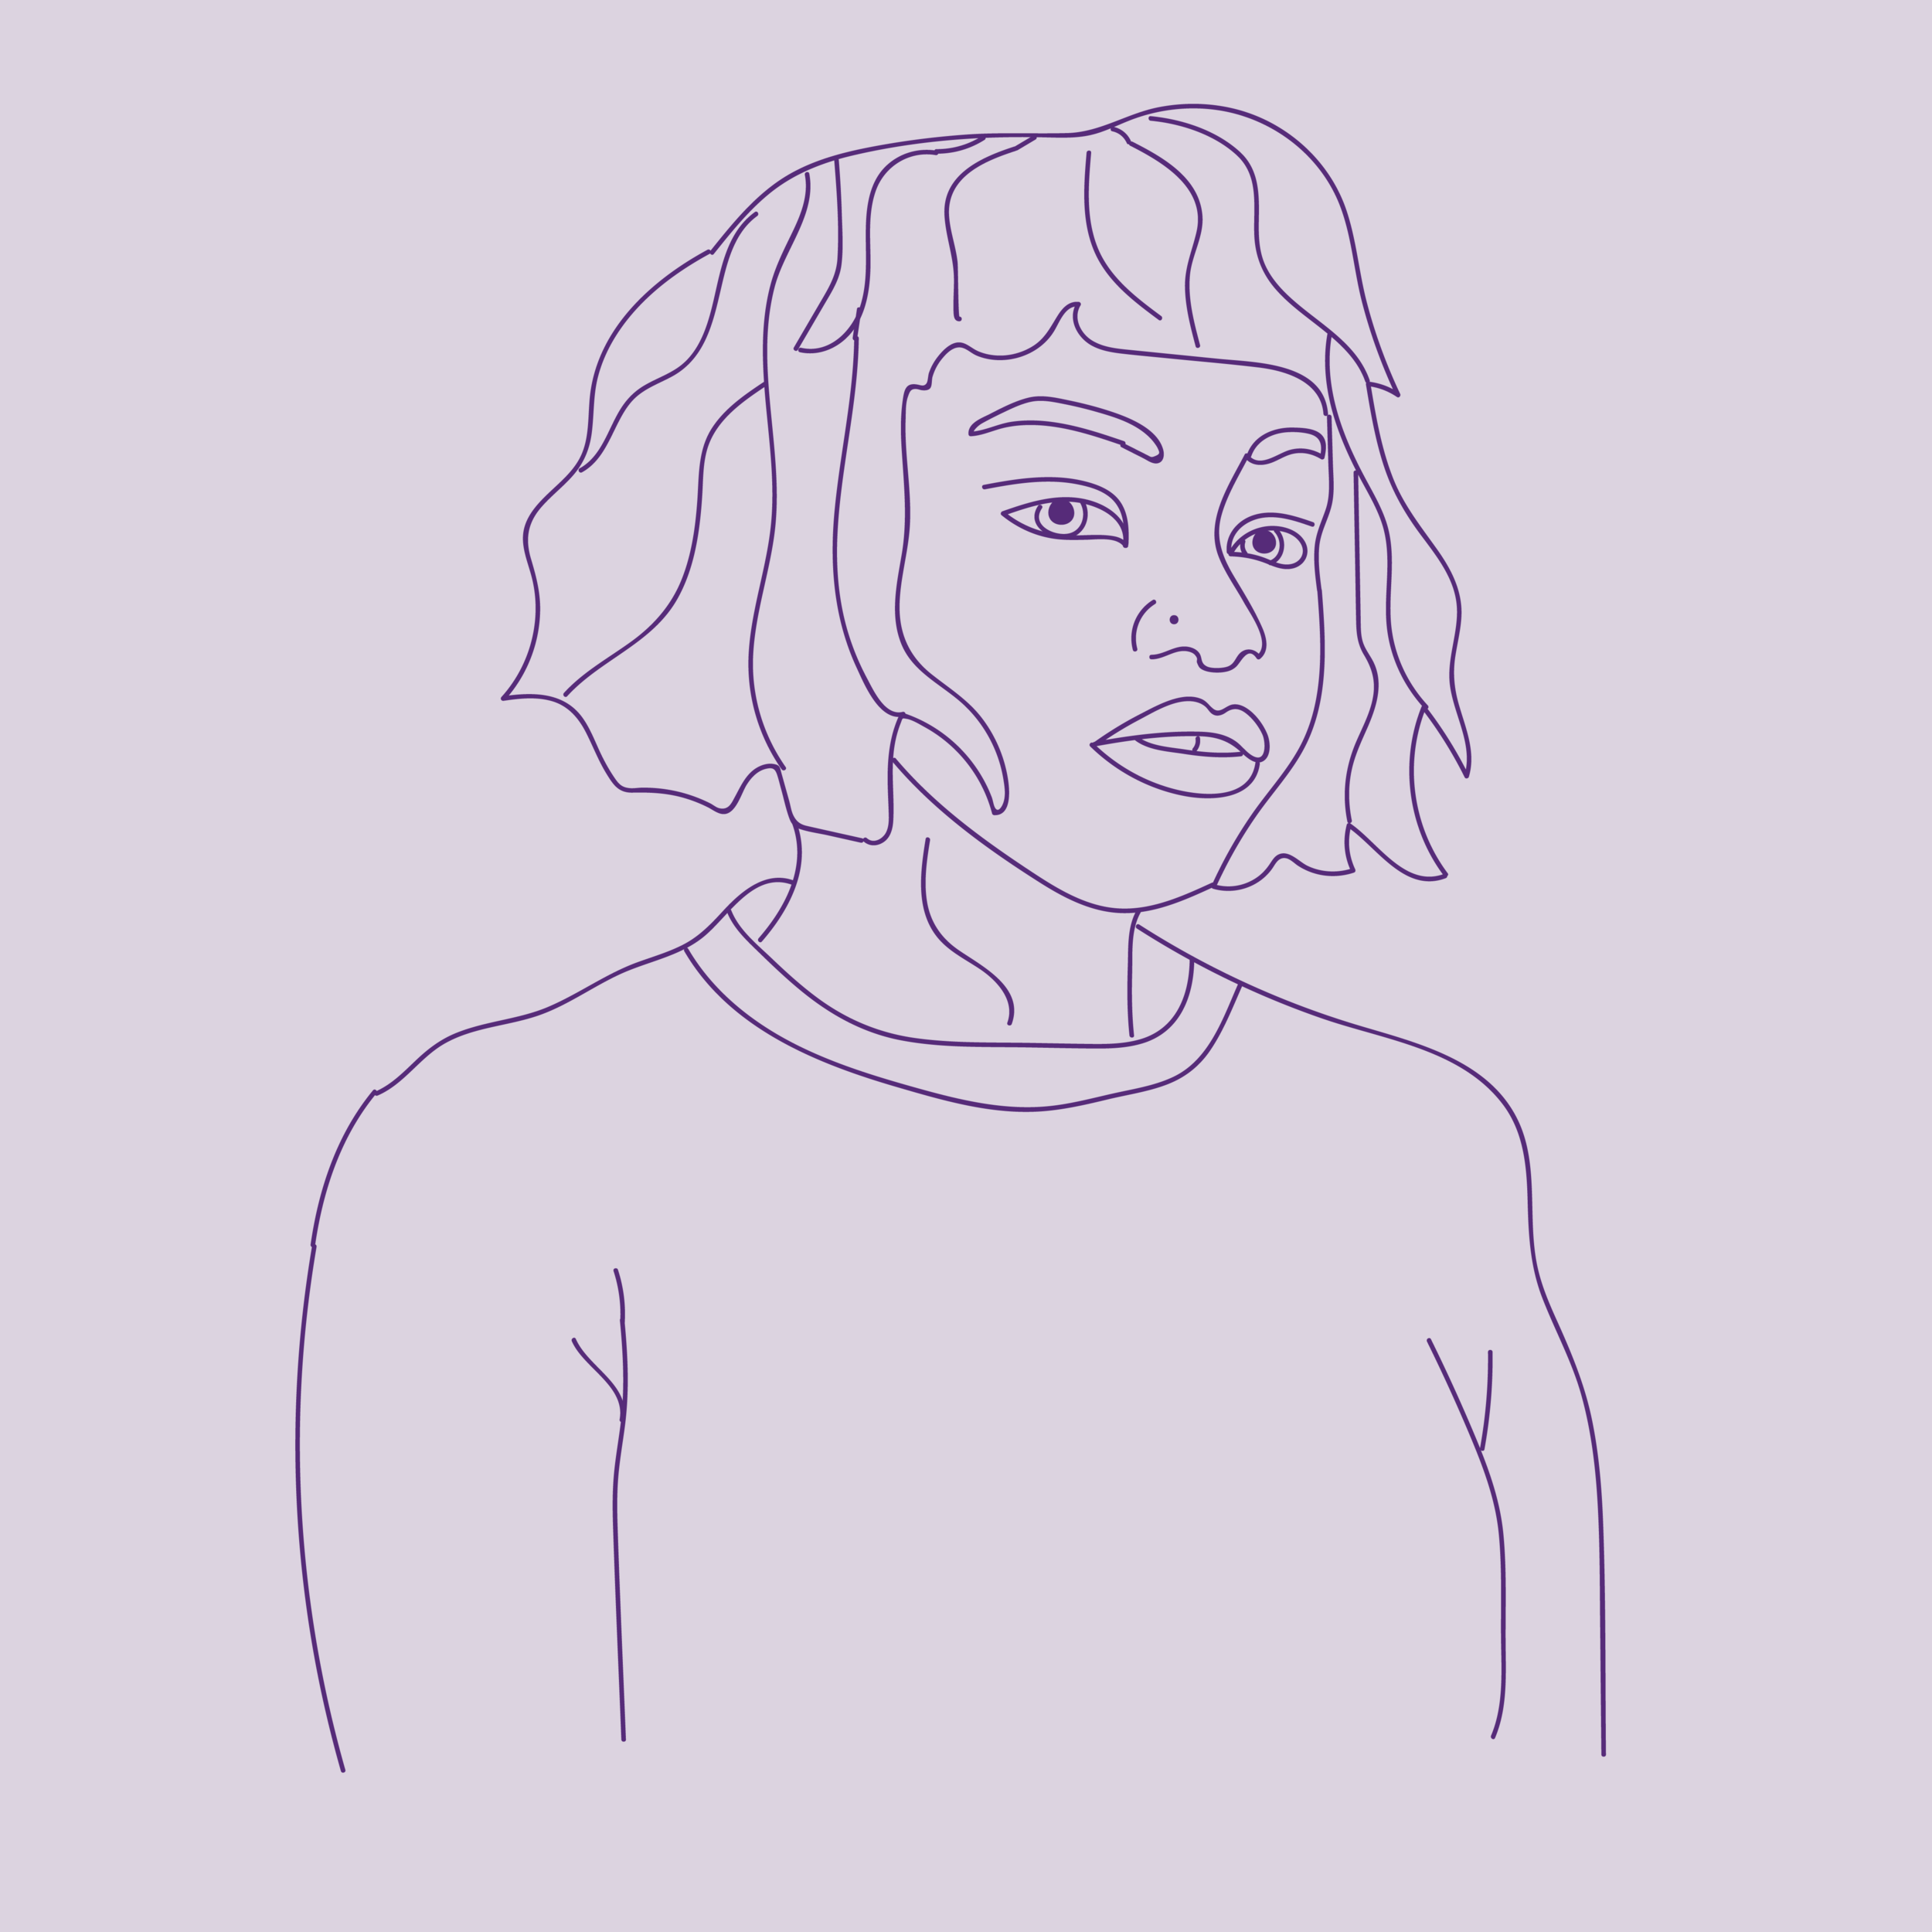 line drawings-05.png